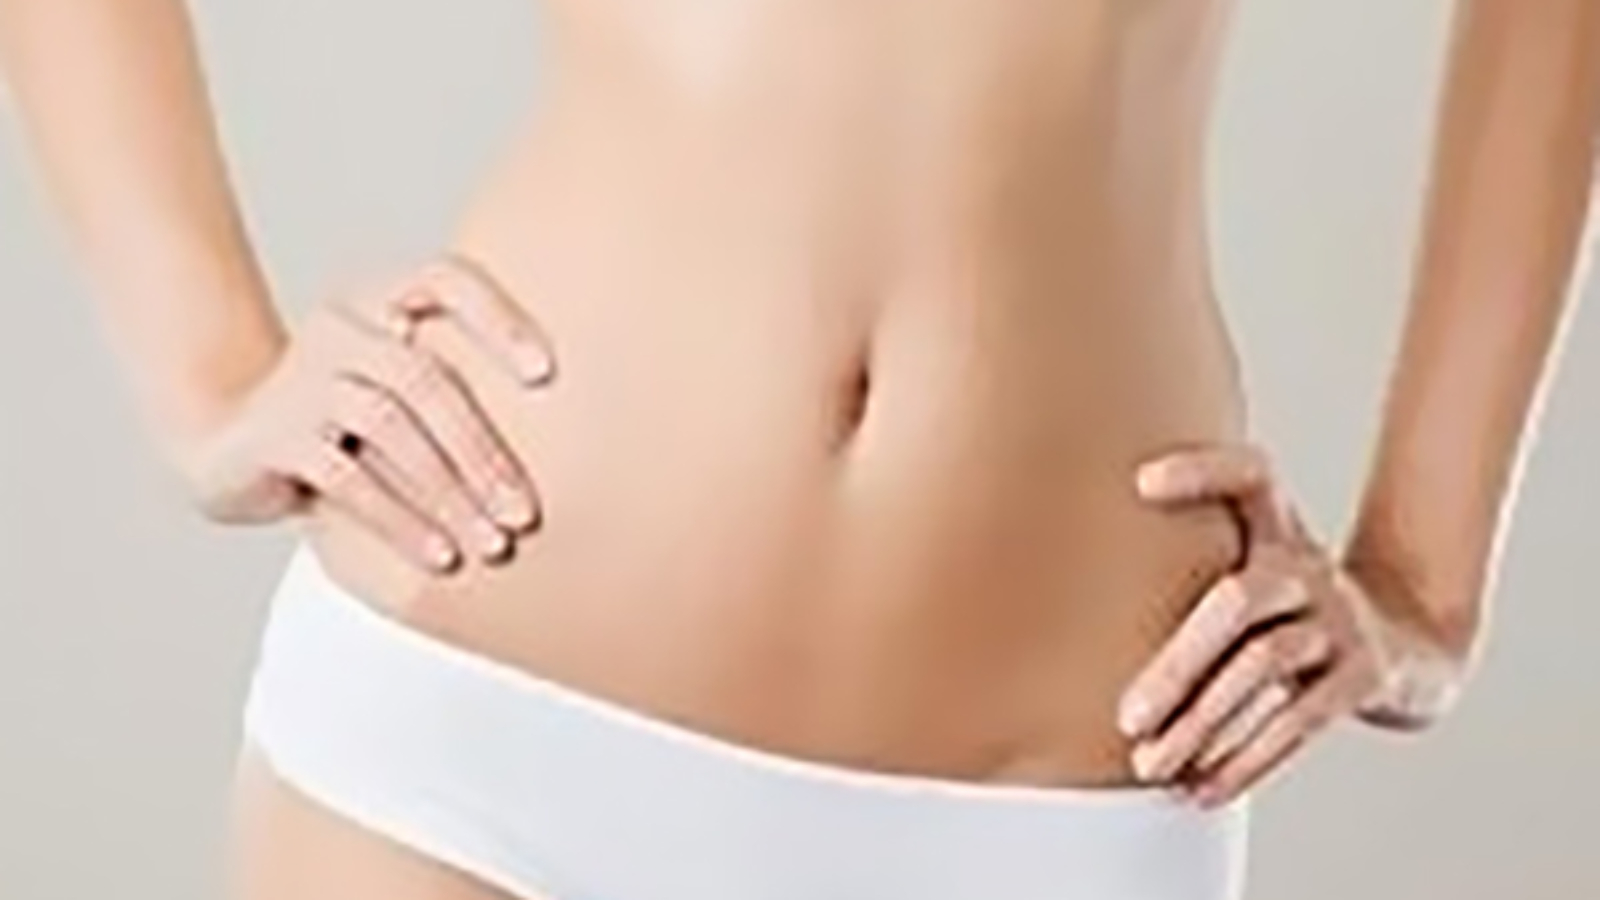 vajina-daraltma-sonrasi-duzeltme-33